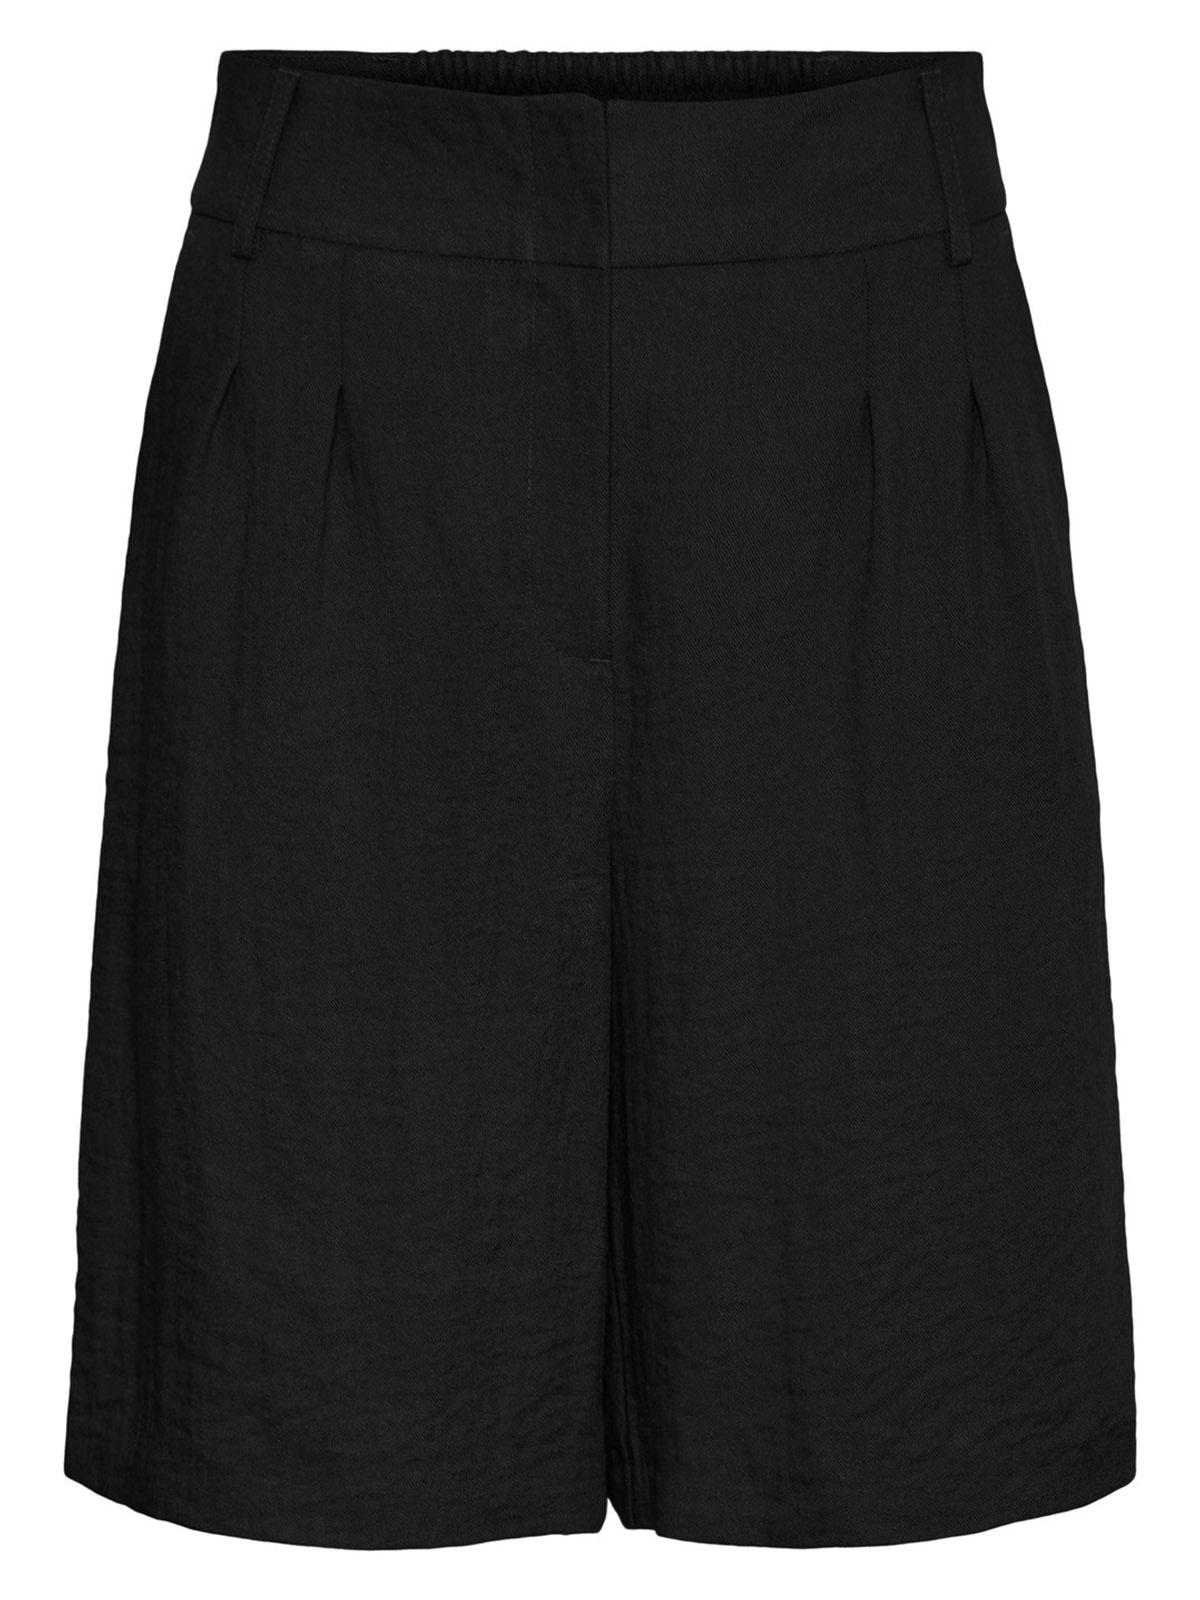 Vero Moda Kaylee shorts